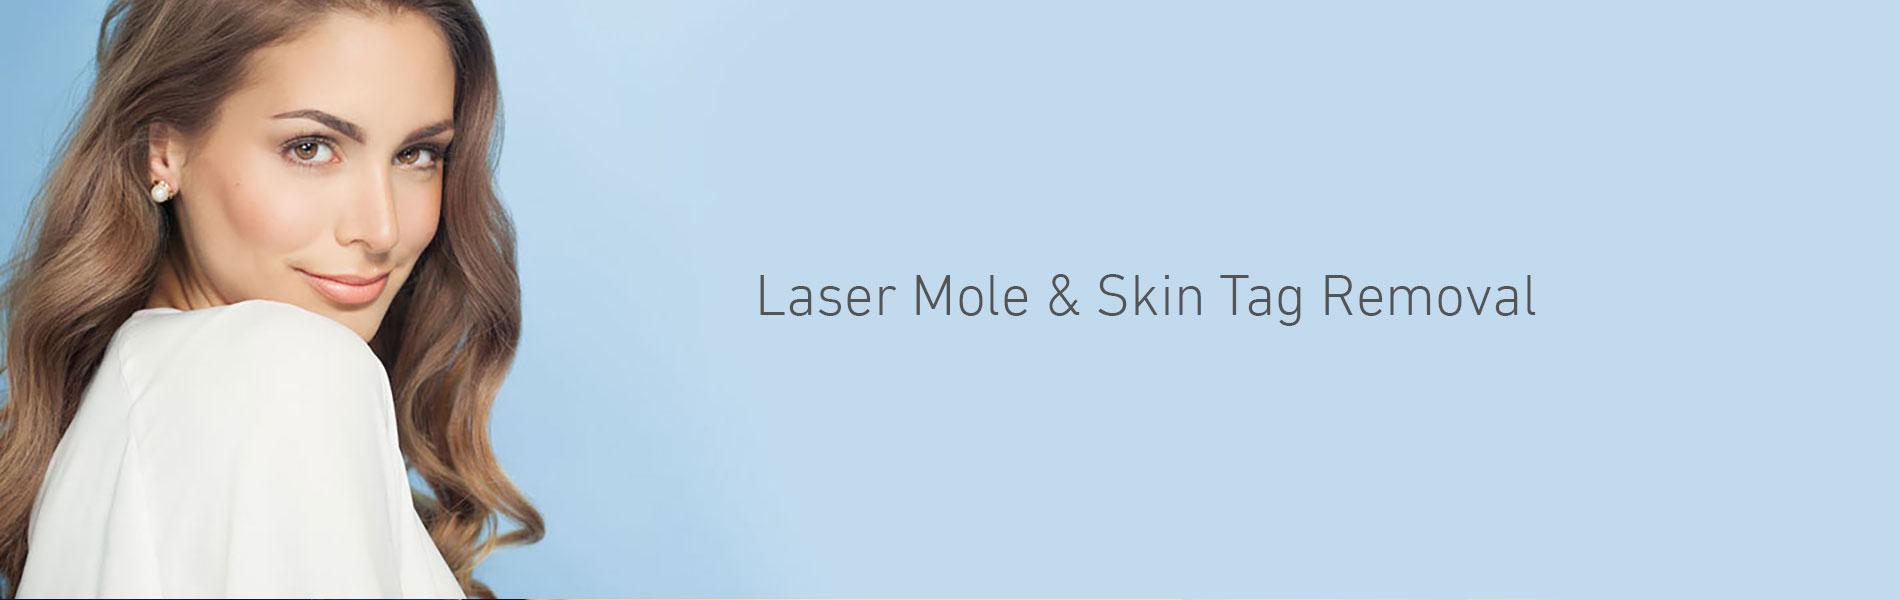 Laser Mole Skin Tag Removal Southampton Hampshire Aesthetics Clinics